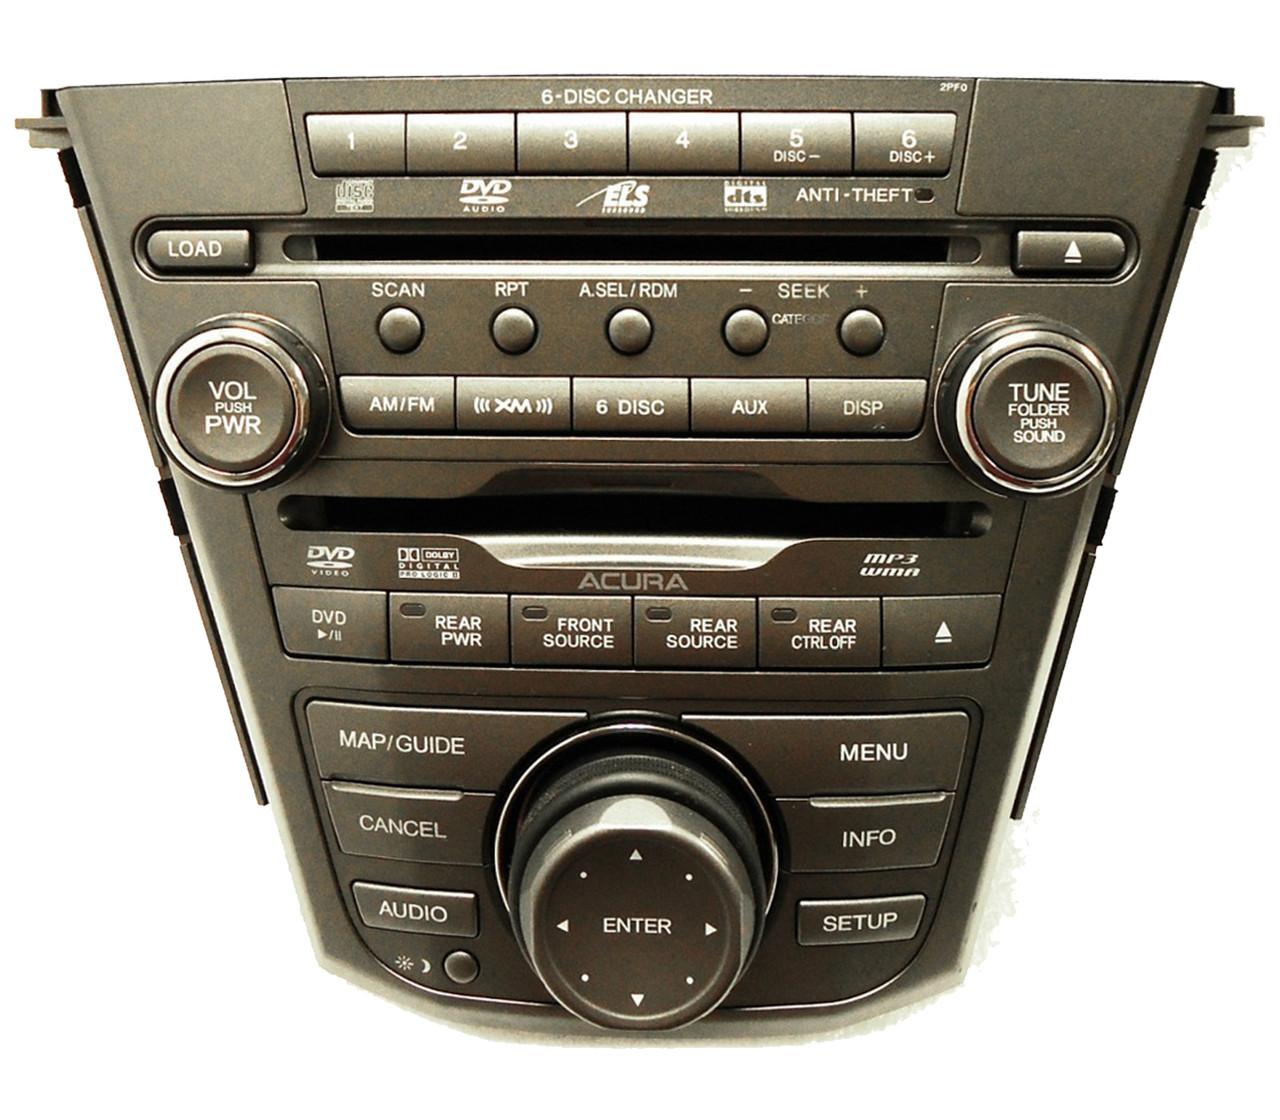 ACURA MDX Radio Navigation Teck 6 Disc Changer MP3 CD DVD